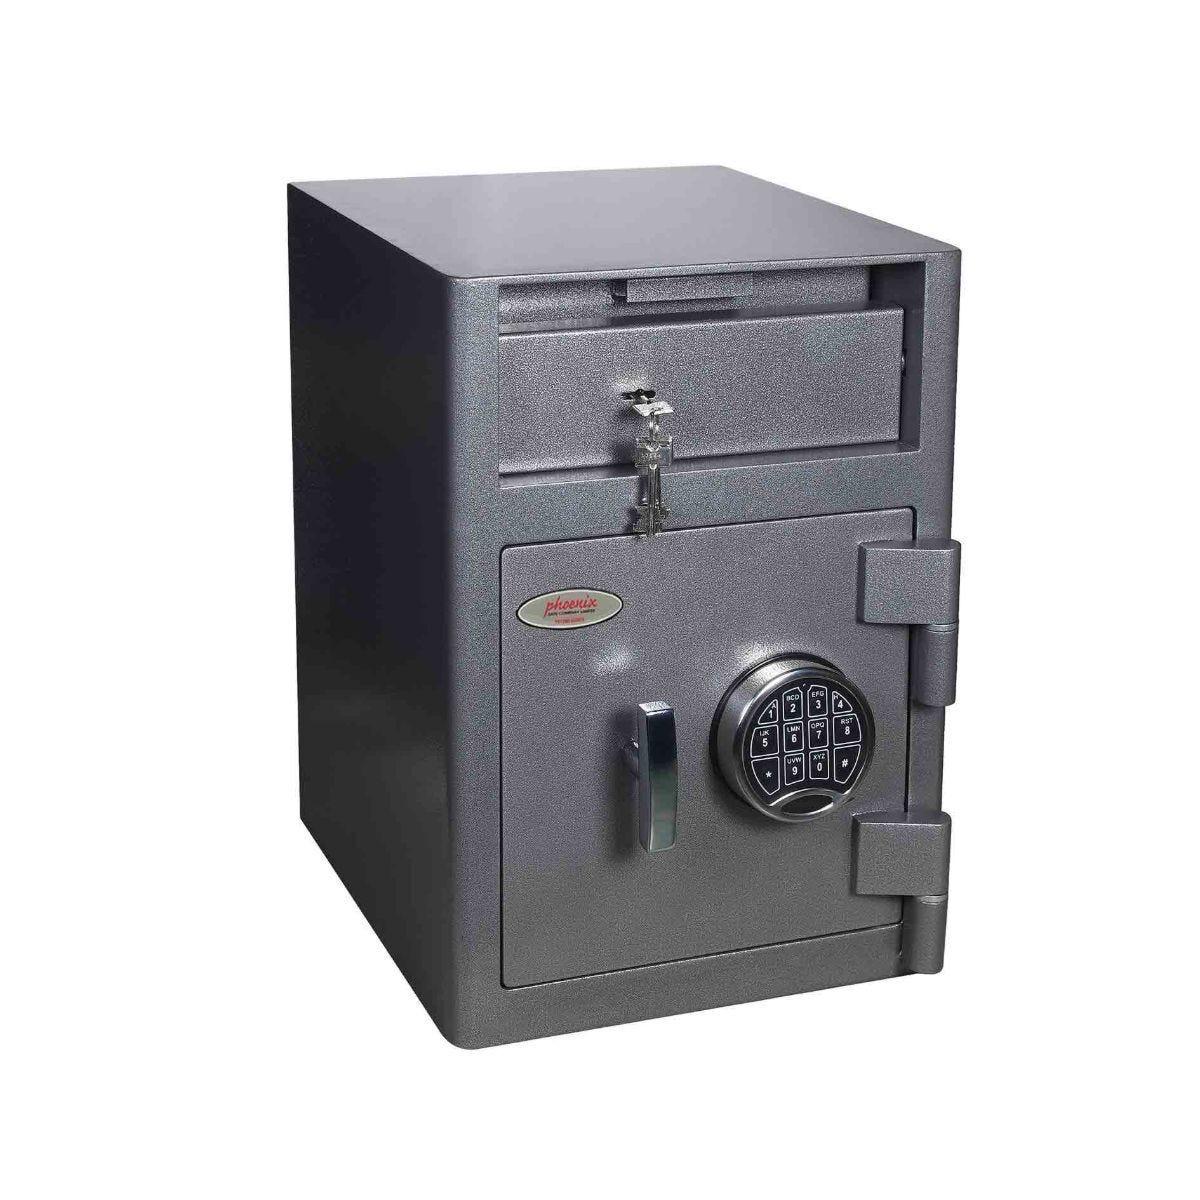 Phoenix Cash Deposit Security Safe with Electronic Lock Size 1